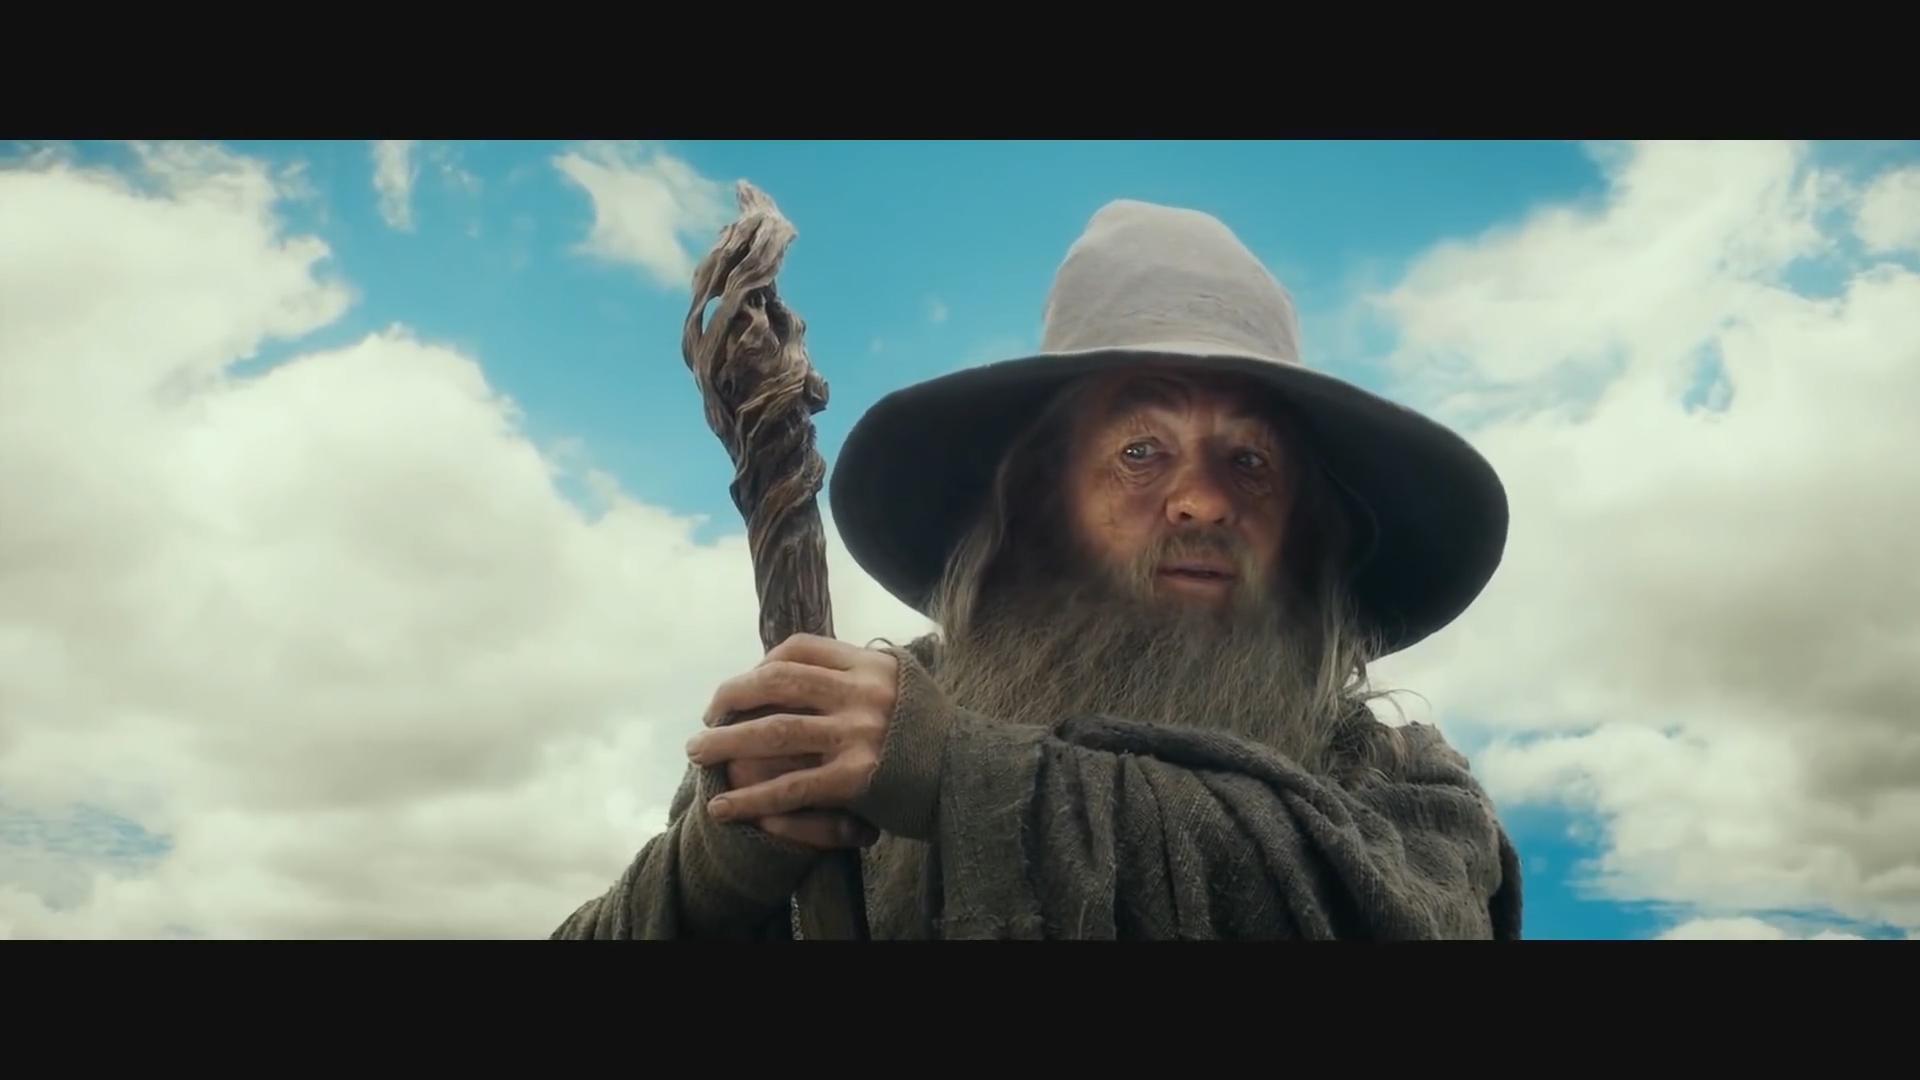 The Hobbit An Unexpected Journey - Bilbo meets Gandalf